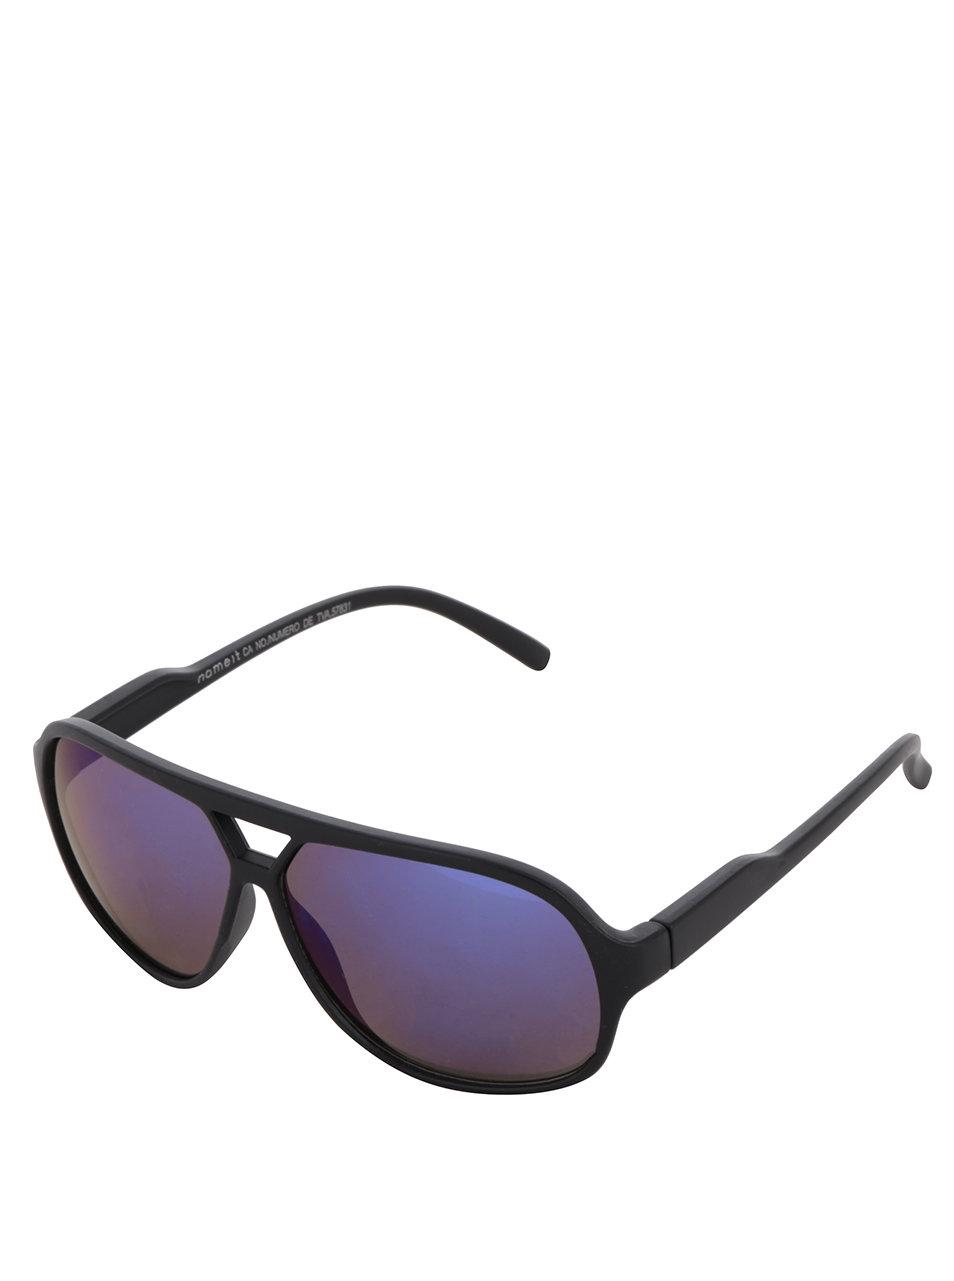 258abaf4a Čierne chlapčenské slnečné okuliare s modrými sklami name it | ZOOT.sk